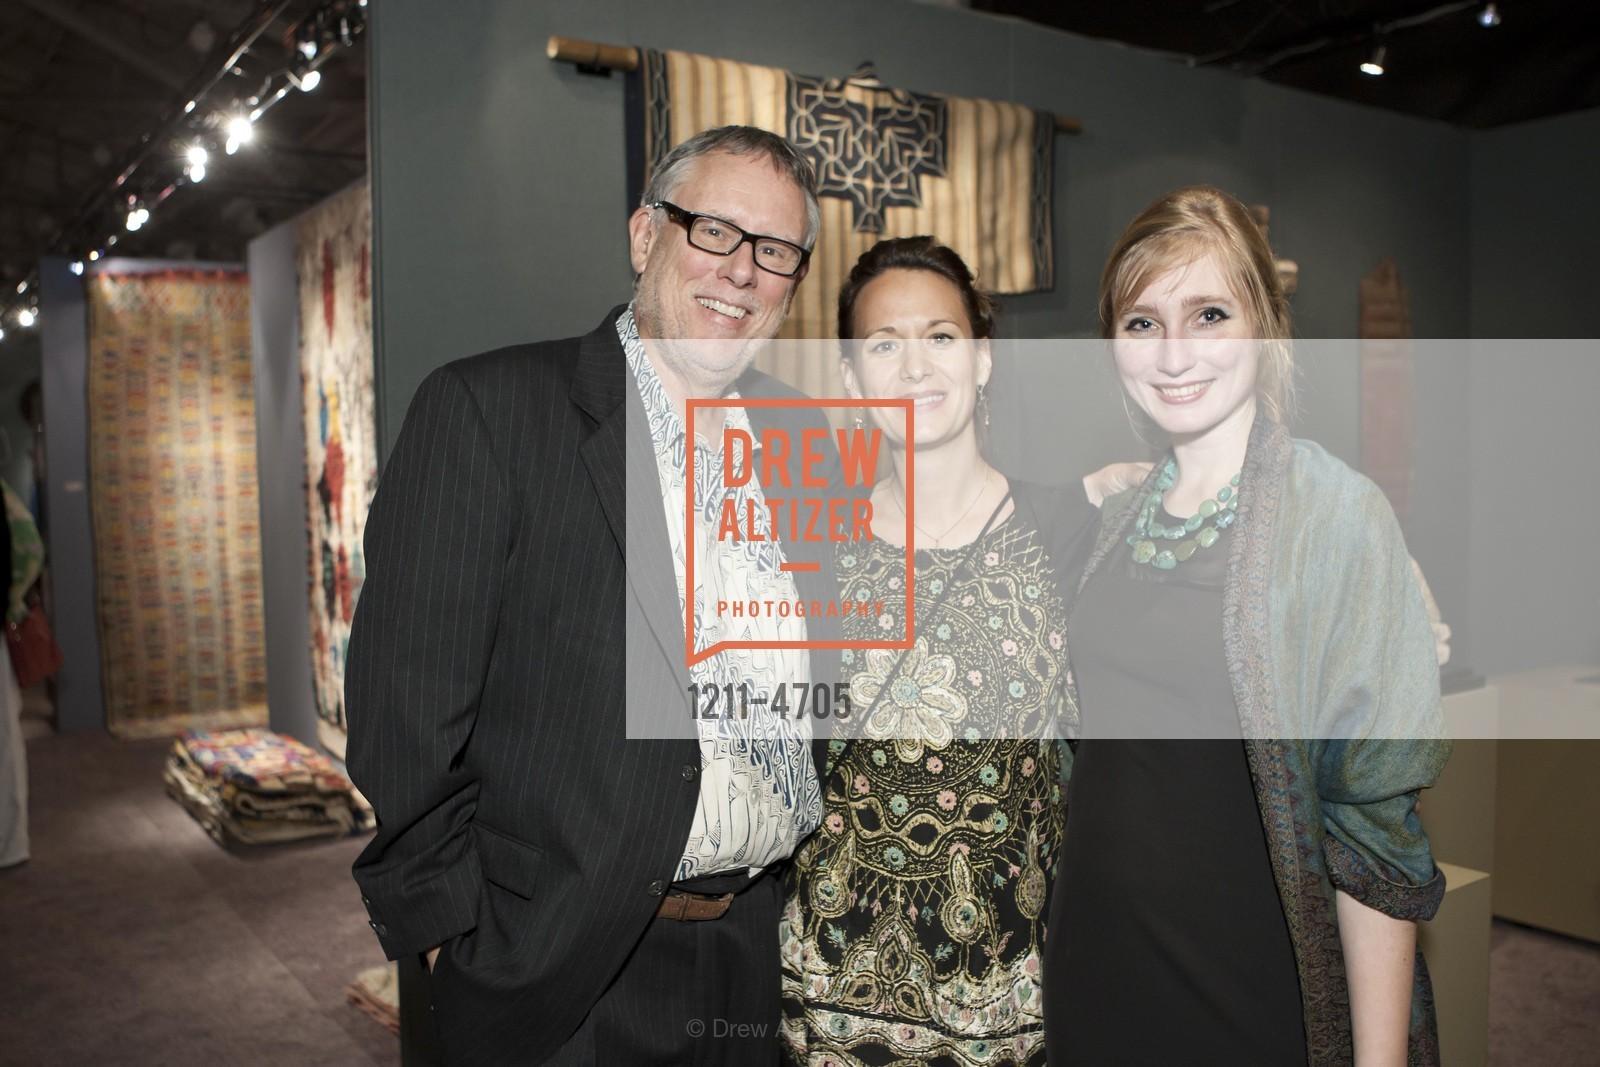 Thomas Murray, Nora Stratton, Krystal Hale, Photo #1211-4705